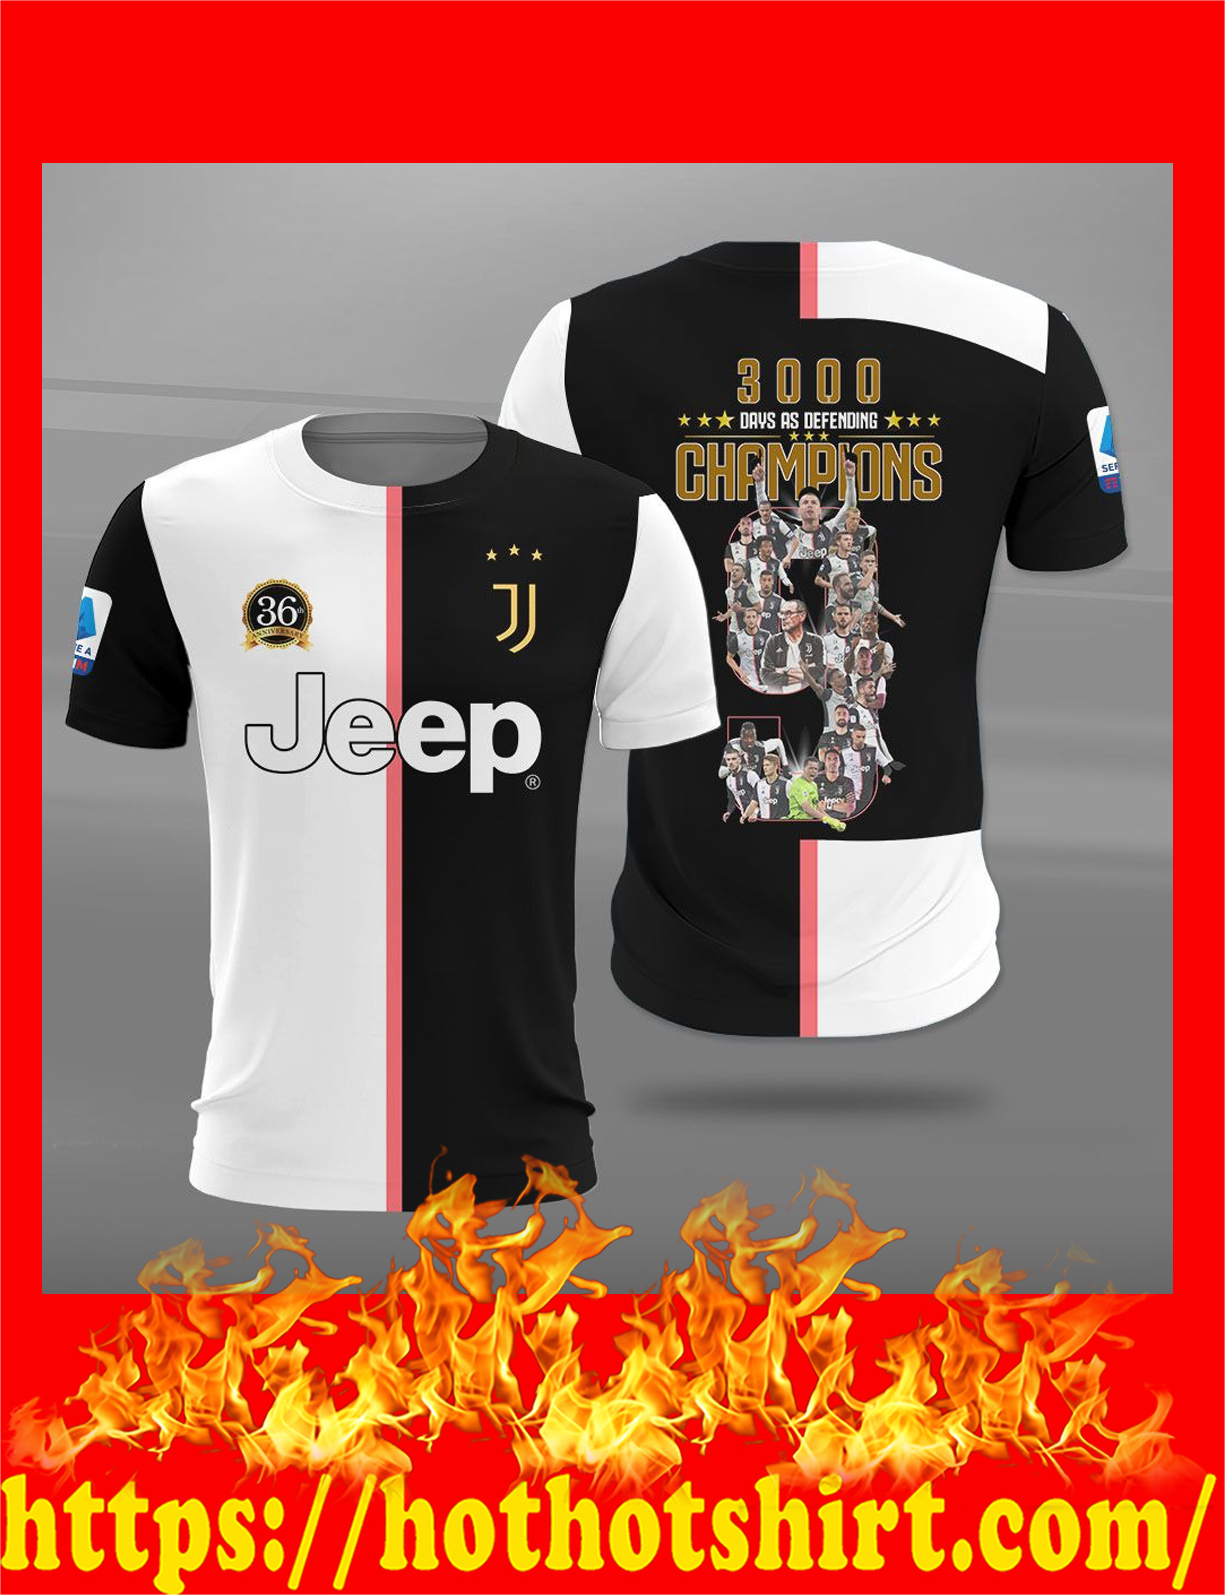 Juventus 3000 days as defending champions 3d t-shirt